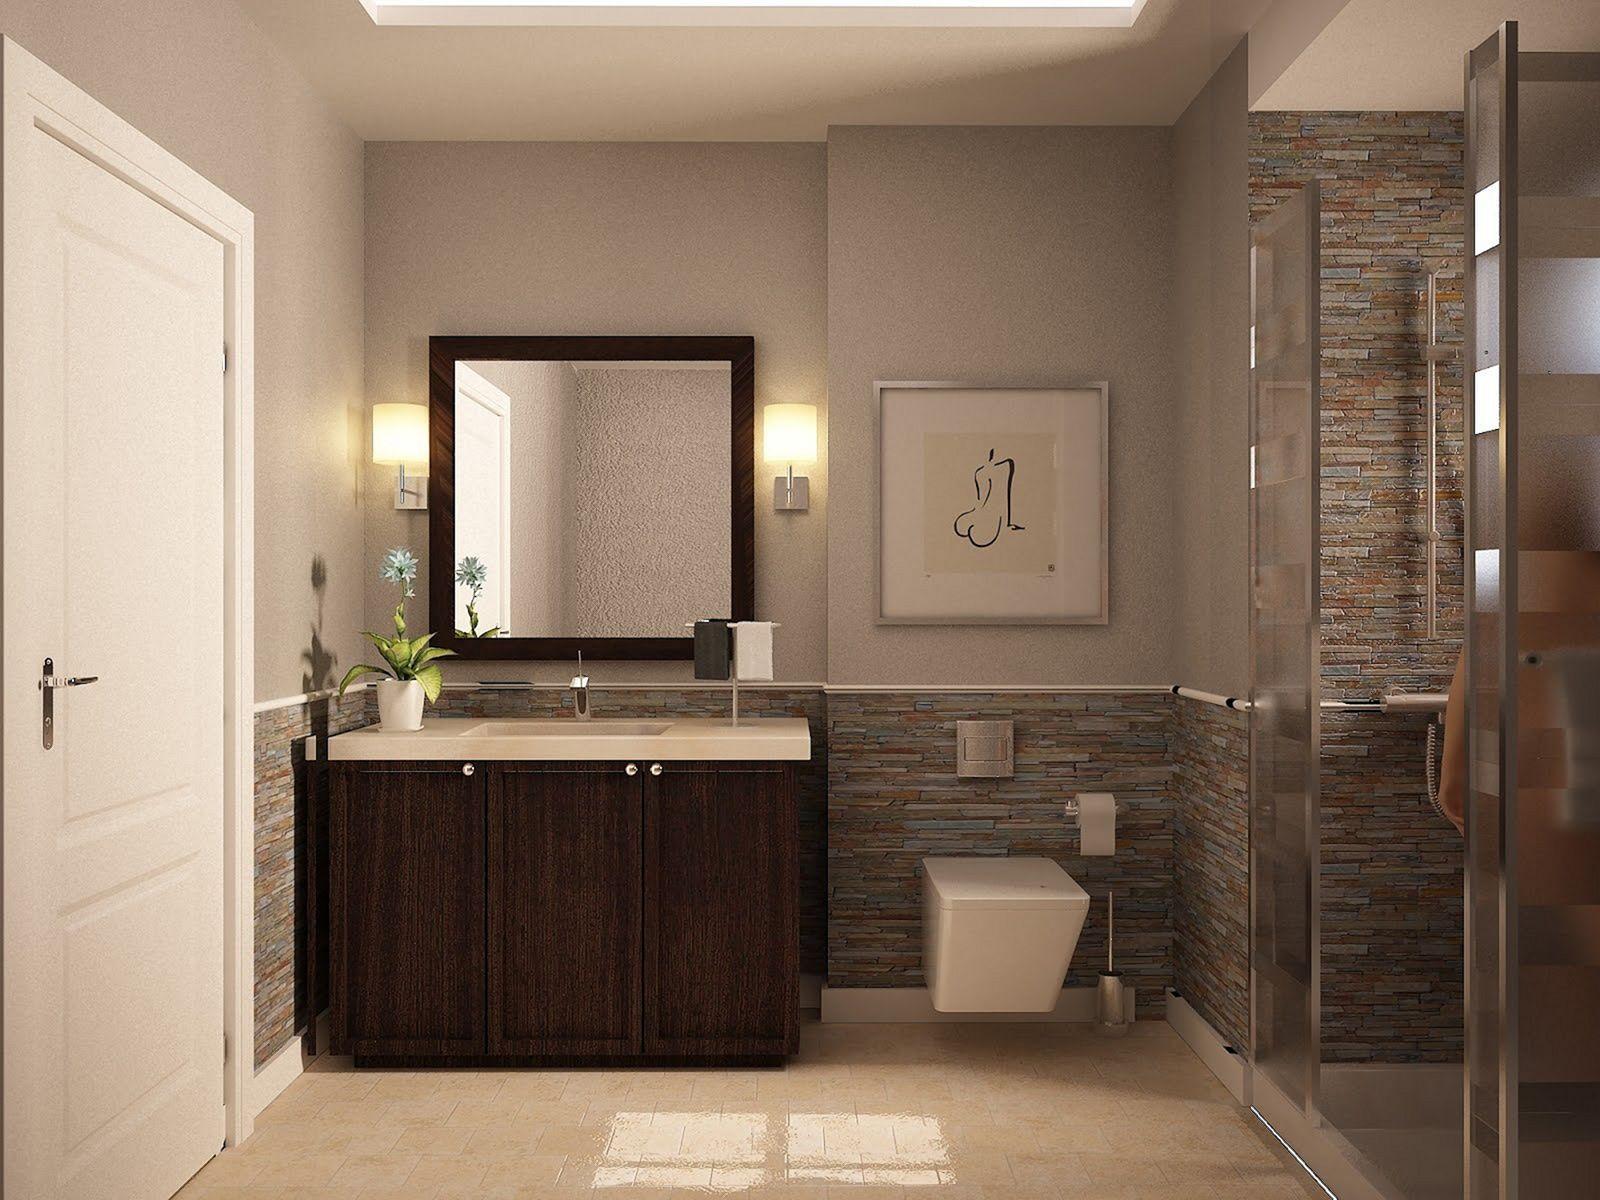 14 Most Charming Bathroom Paint Color Ideas For Fun Bathing Bathroom Color Schemes Bathroom Color Best Bathroom Colors